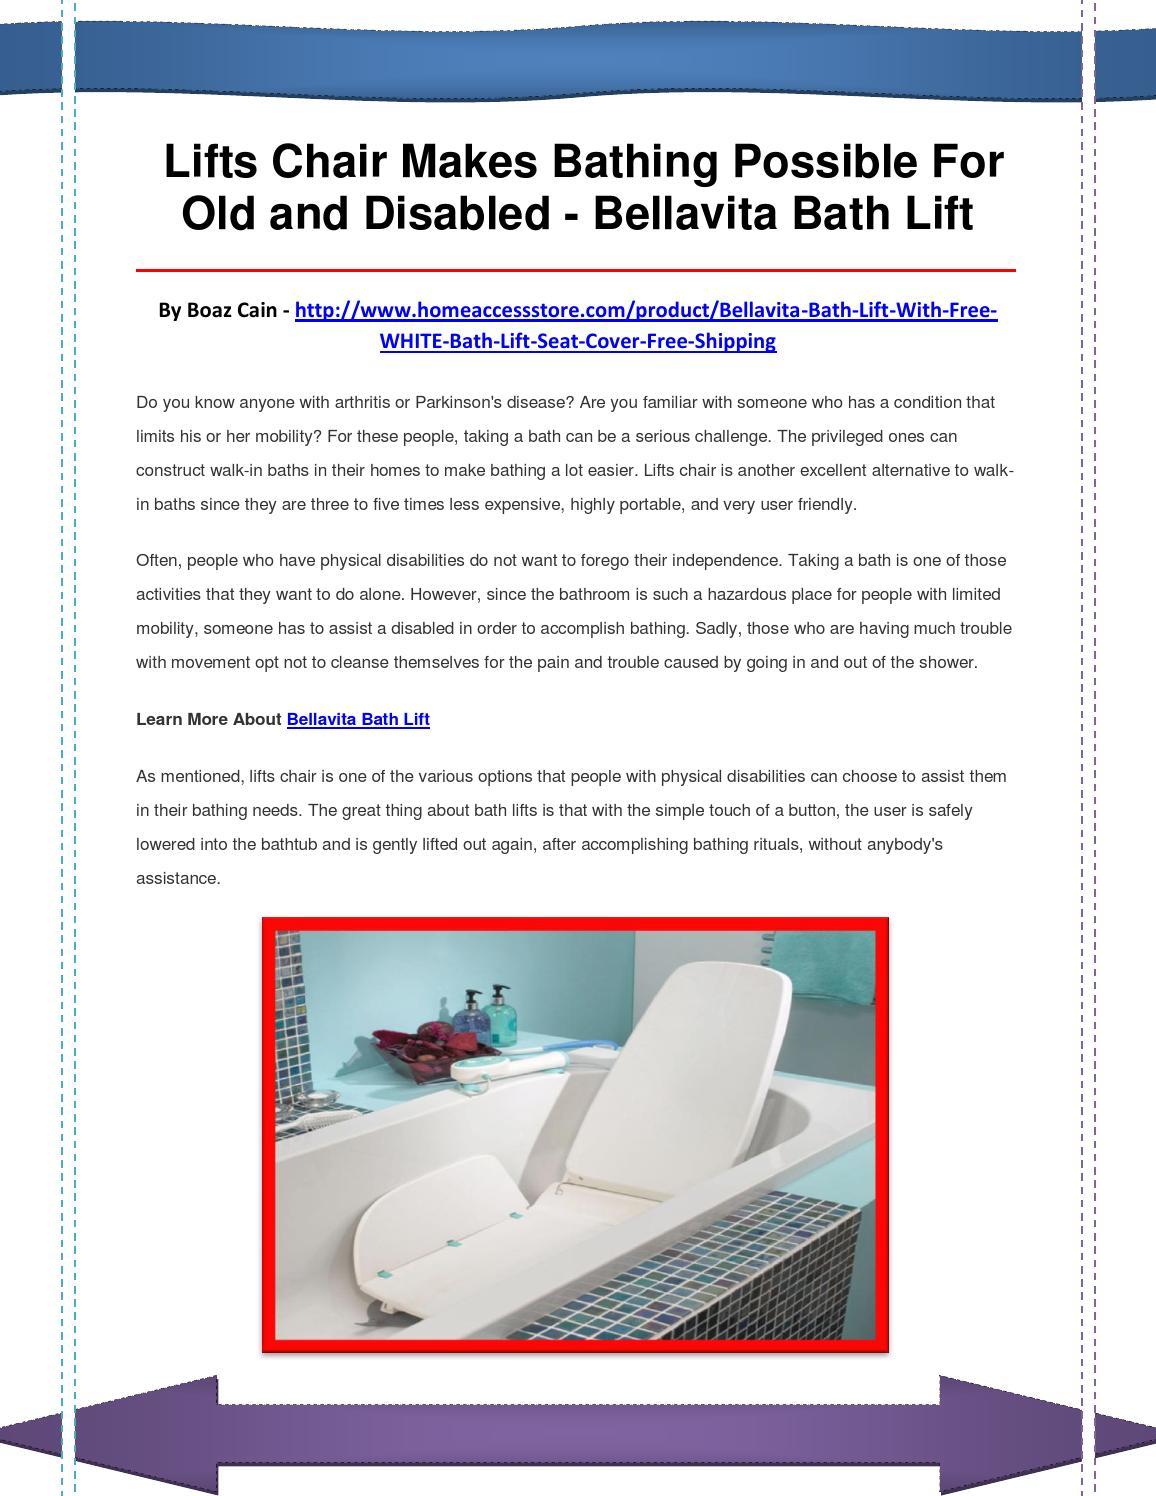 Bellavita Bath Lift By Qwasdfbnmk Issuu